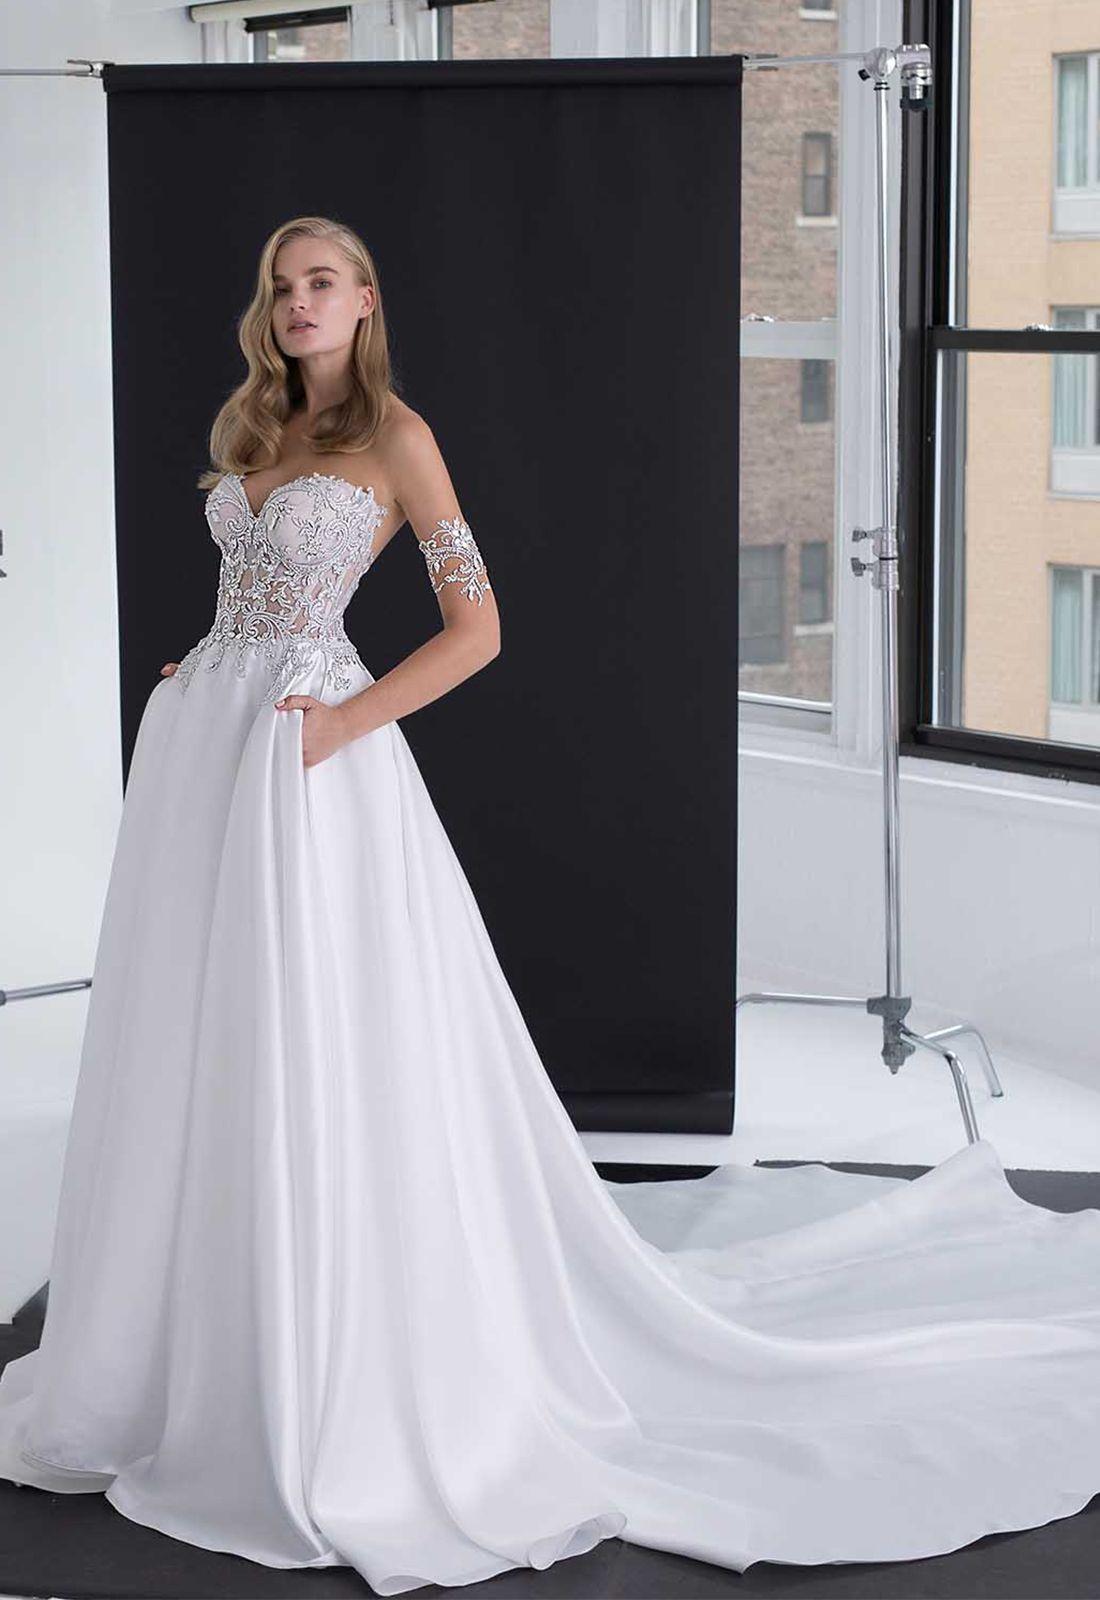 Style No 4720 Pnina Tornai Wedding Dress Pinina Tornai Wedding Dresses Wedding Dresses